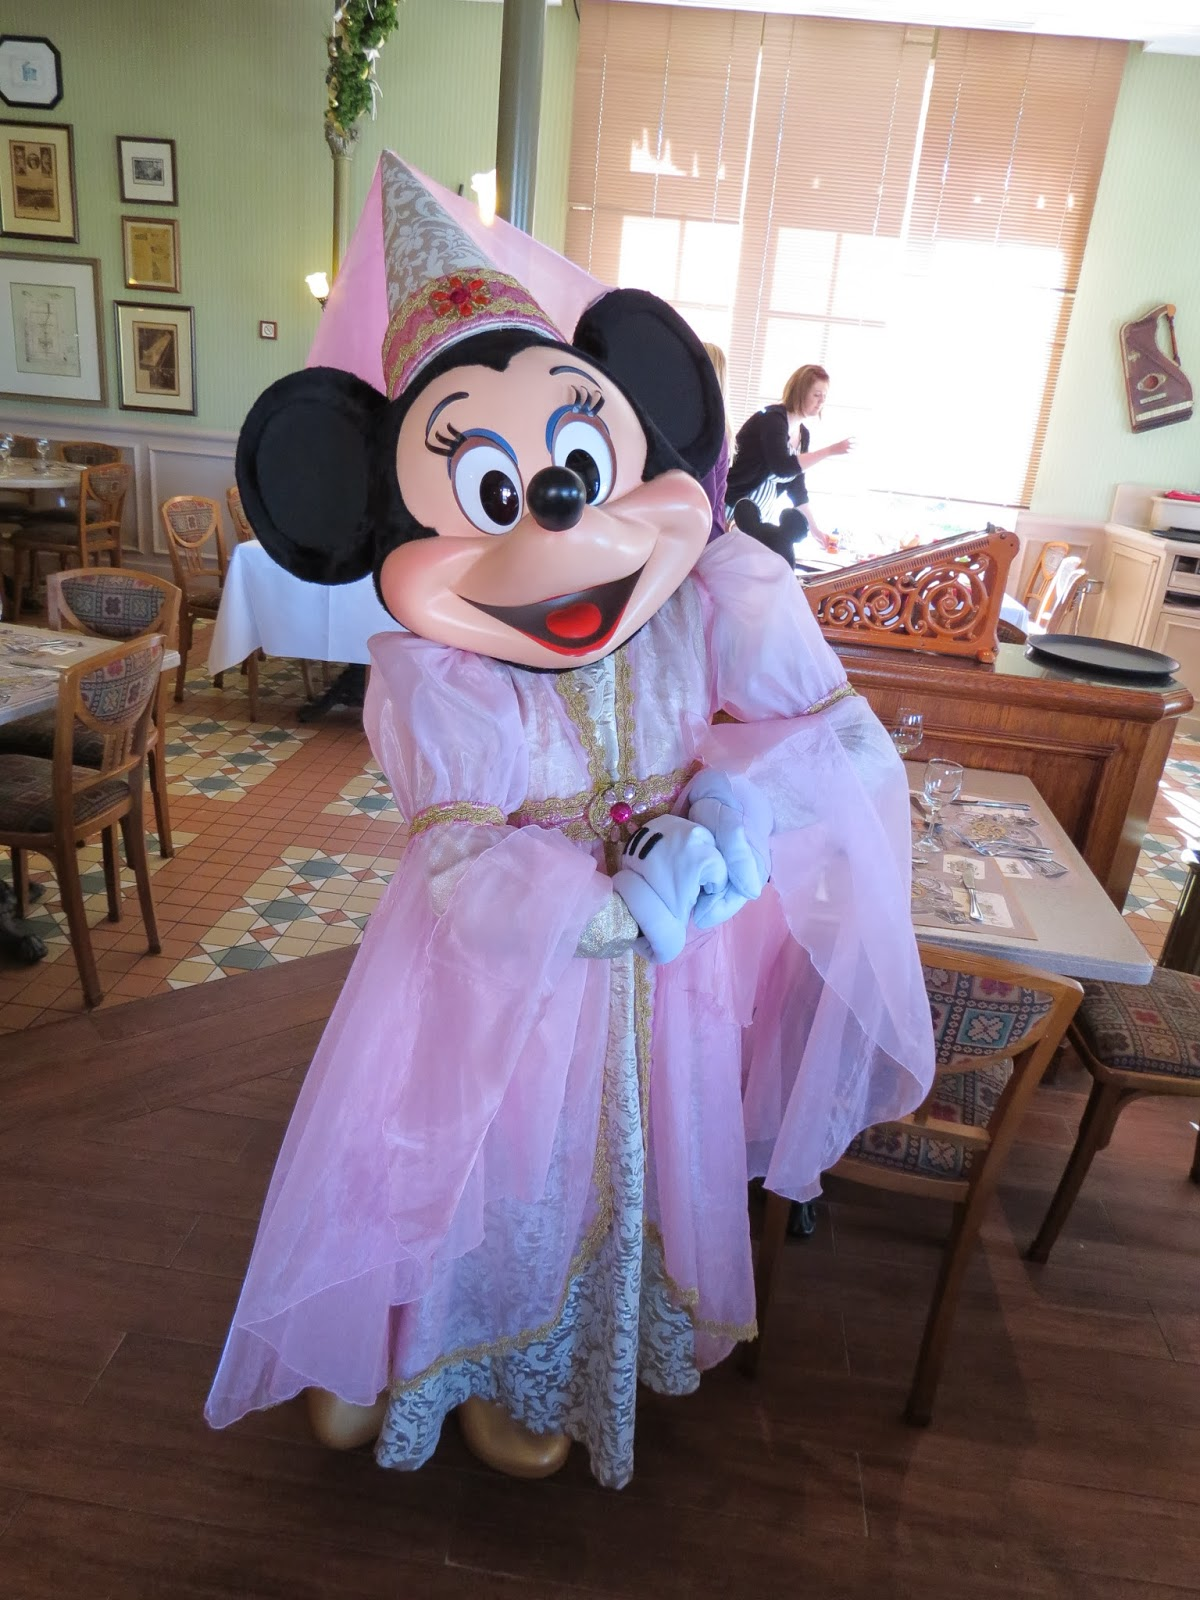 Unofficial disney character hunting guide disneyland - Princesse minnie ...